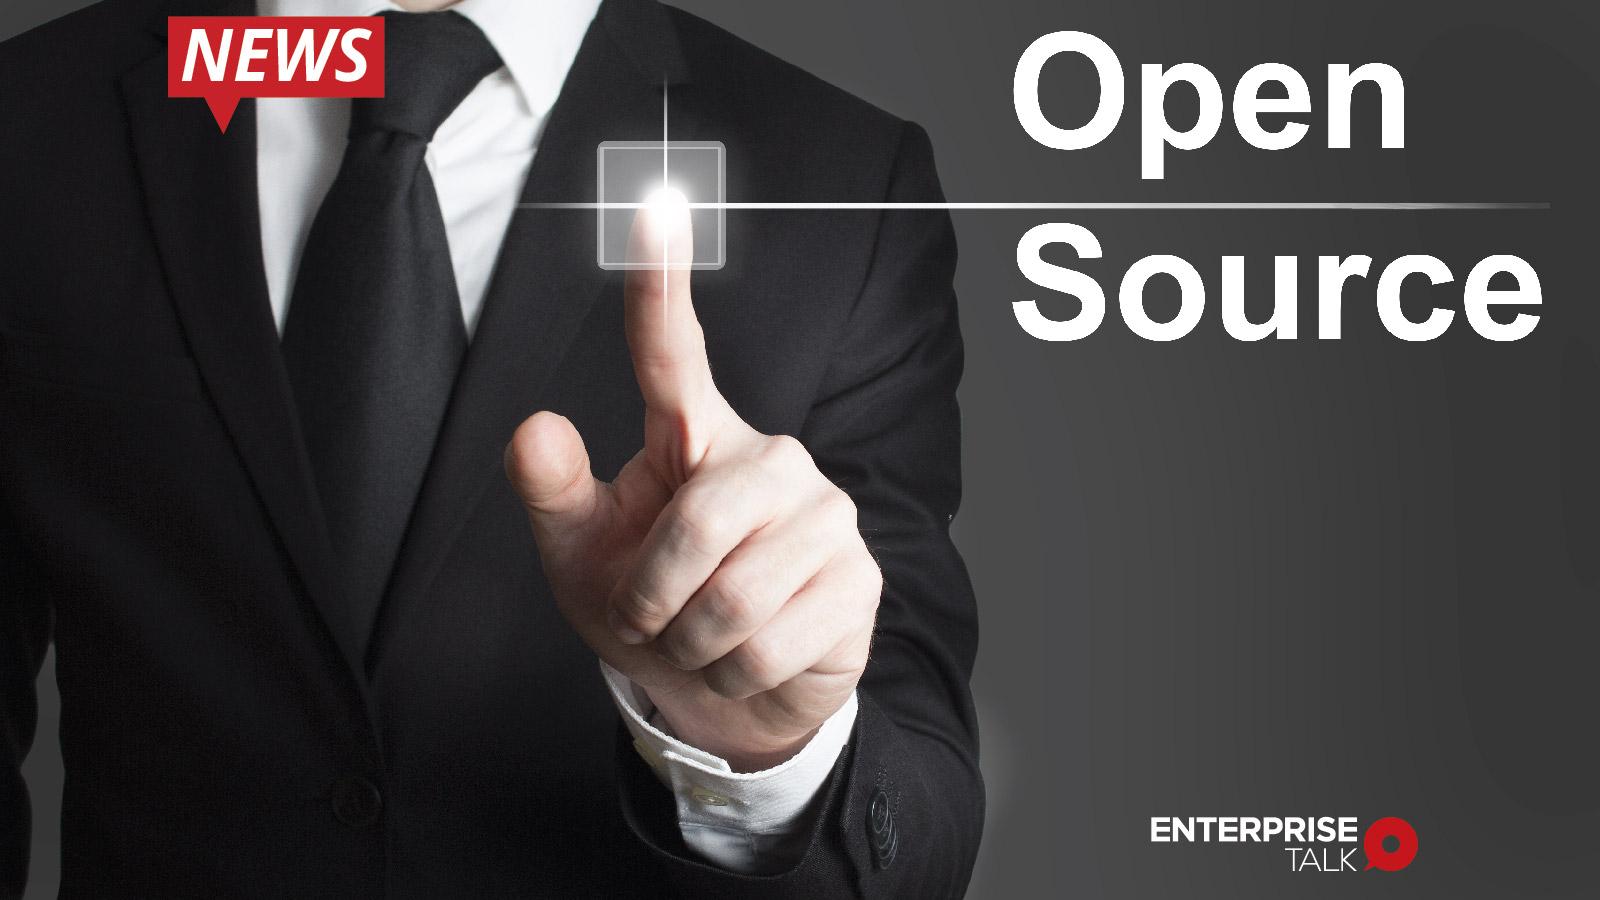 WhiteSource, Enterprise Open Source Security, GitLab Core, Eclipse IDE,